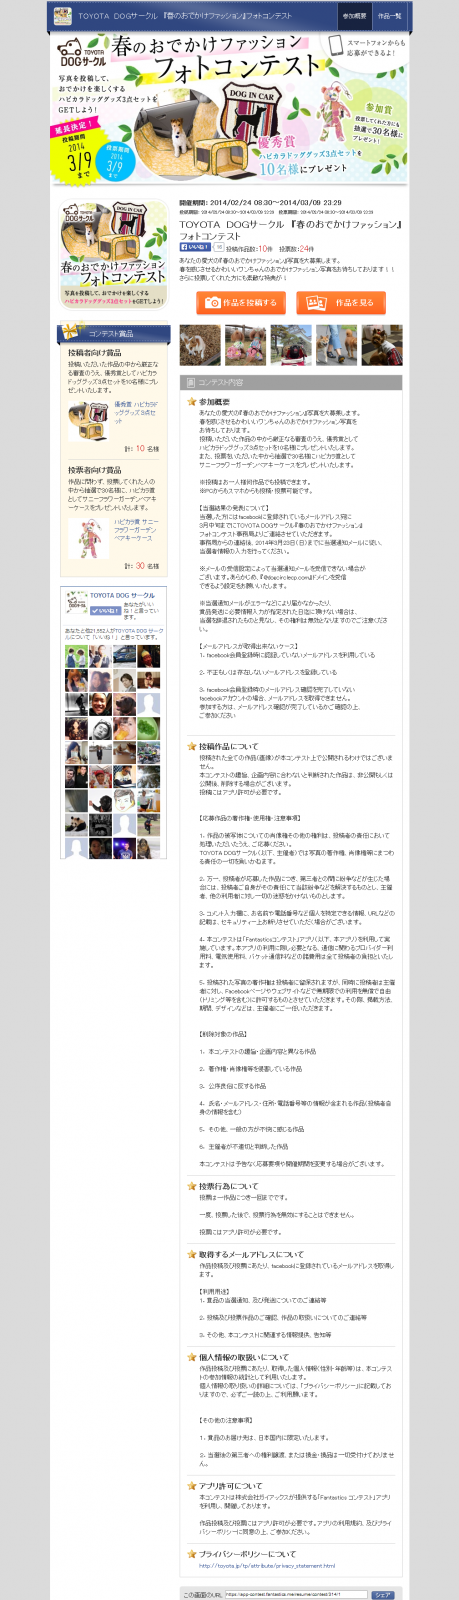 Fantastics 投稿&投票コンテスト(トヨタ自動車株式会社様)